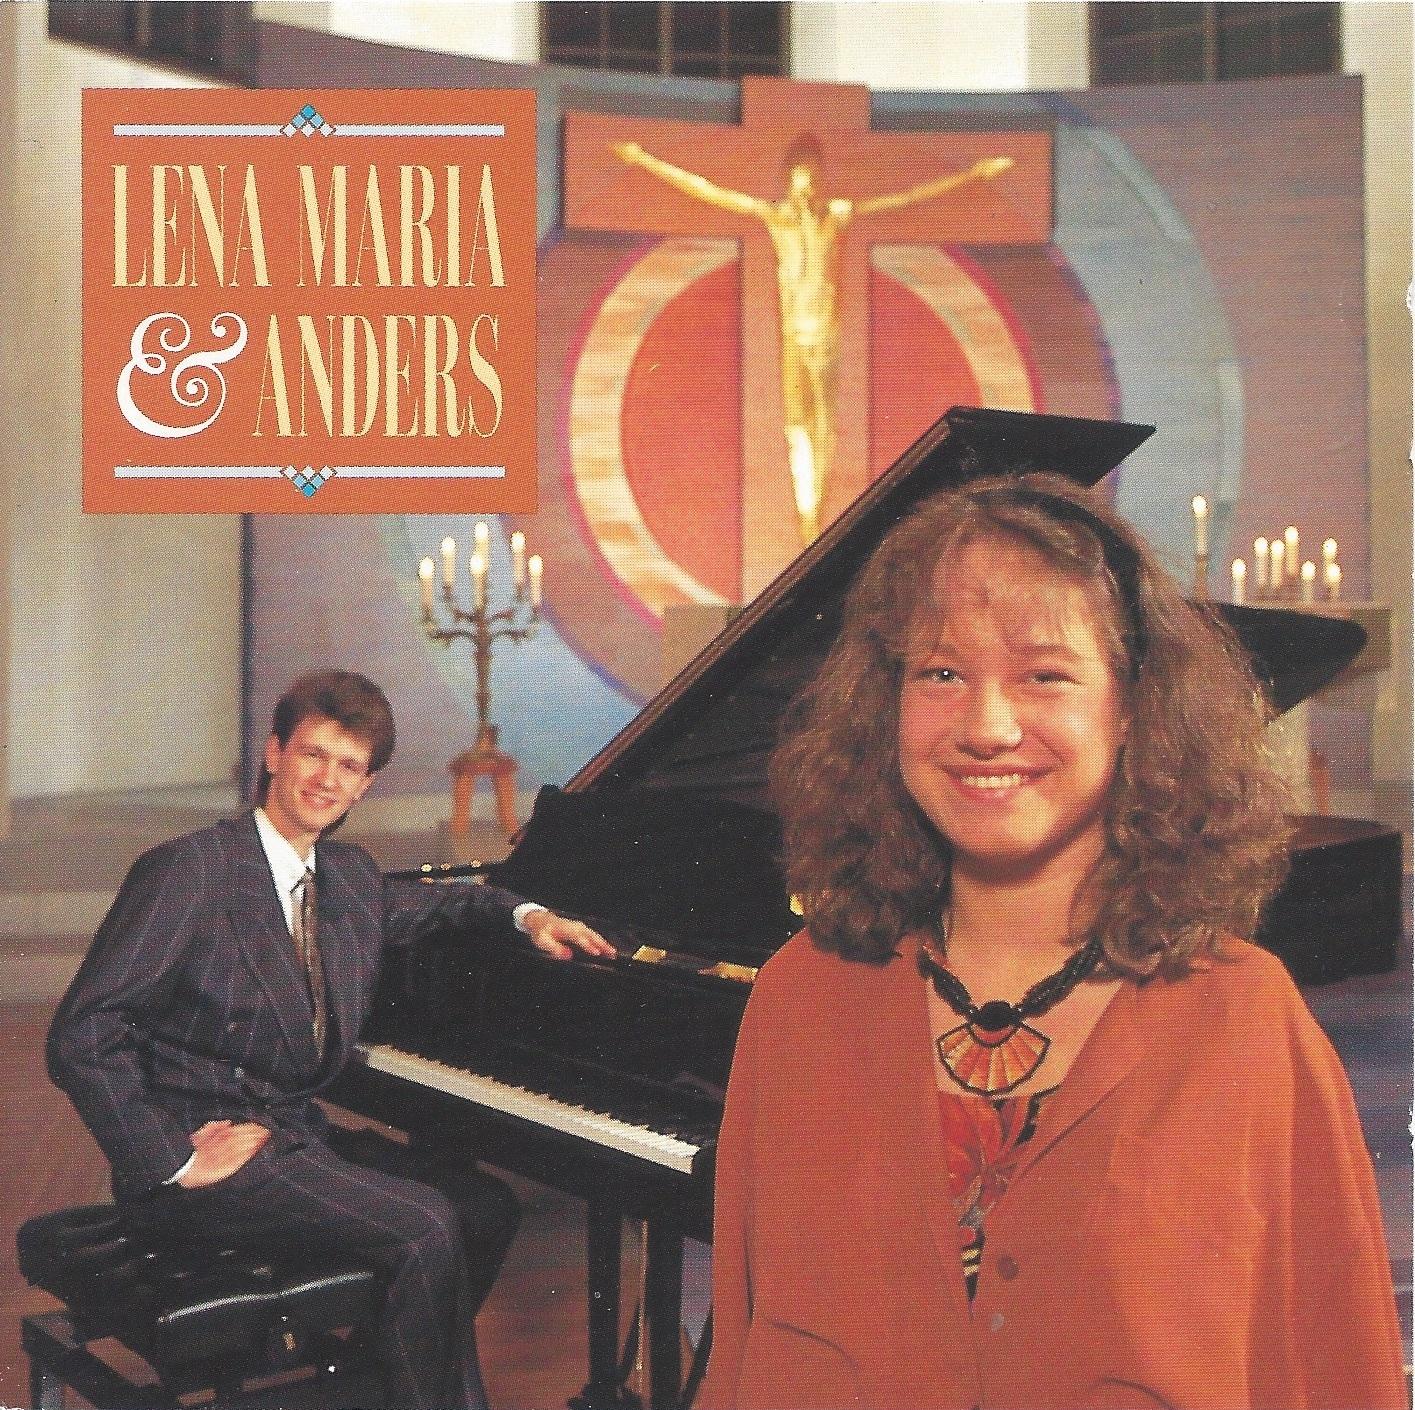 Lena Maria & Anders